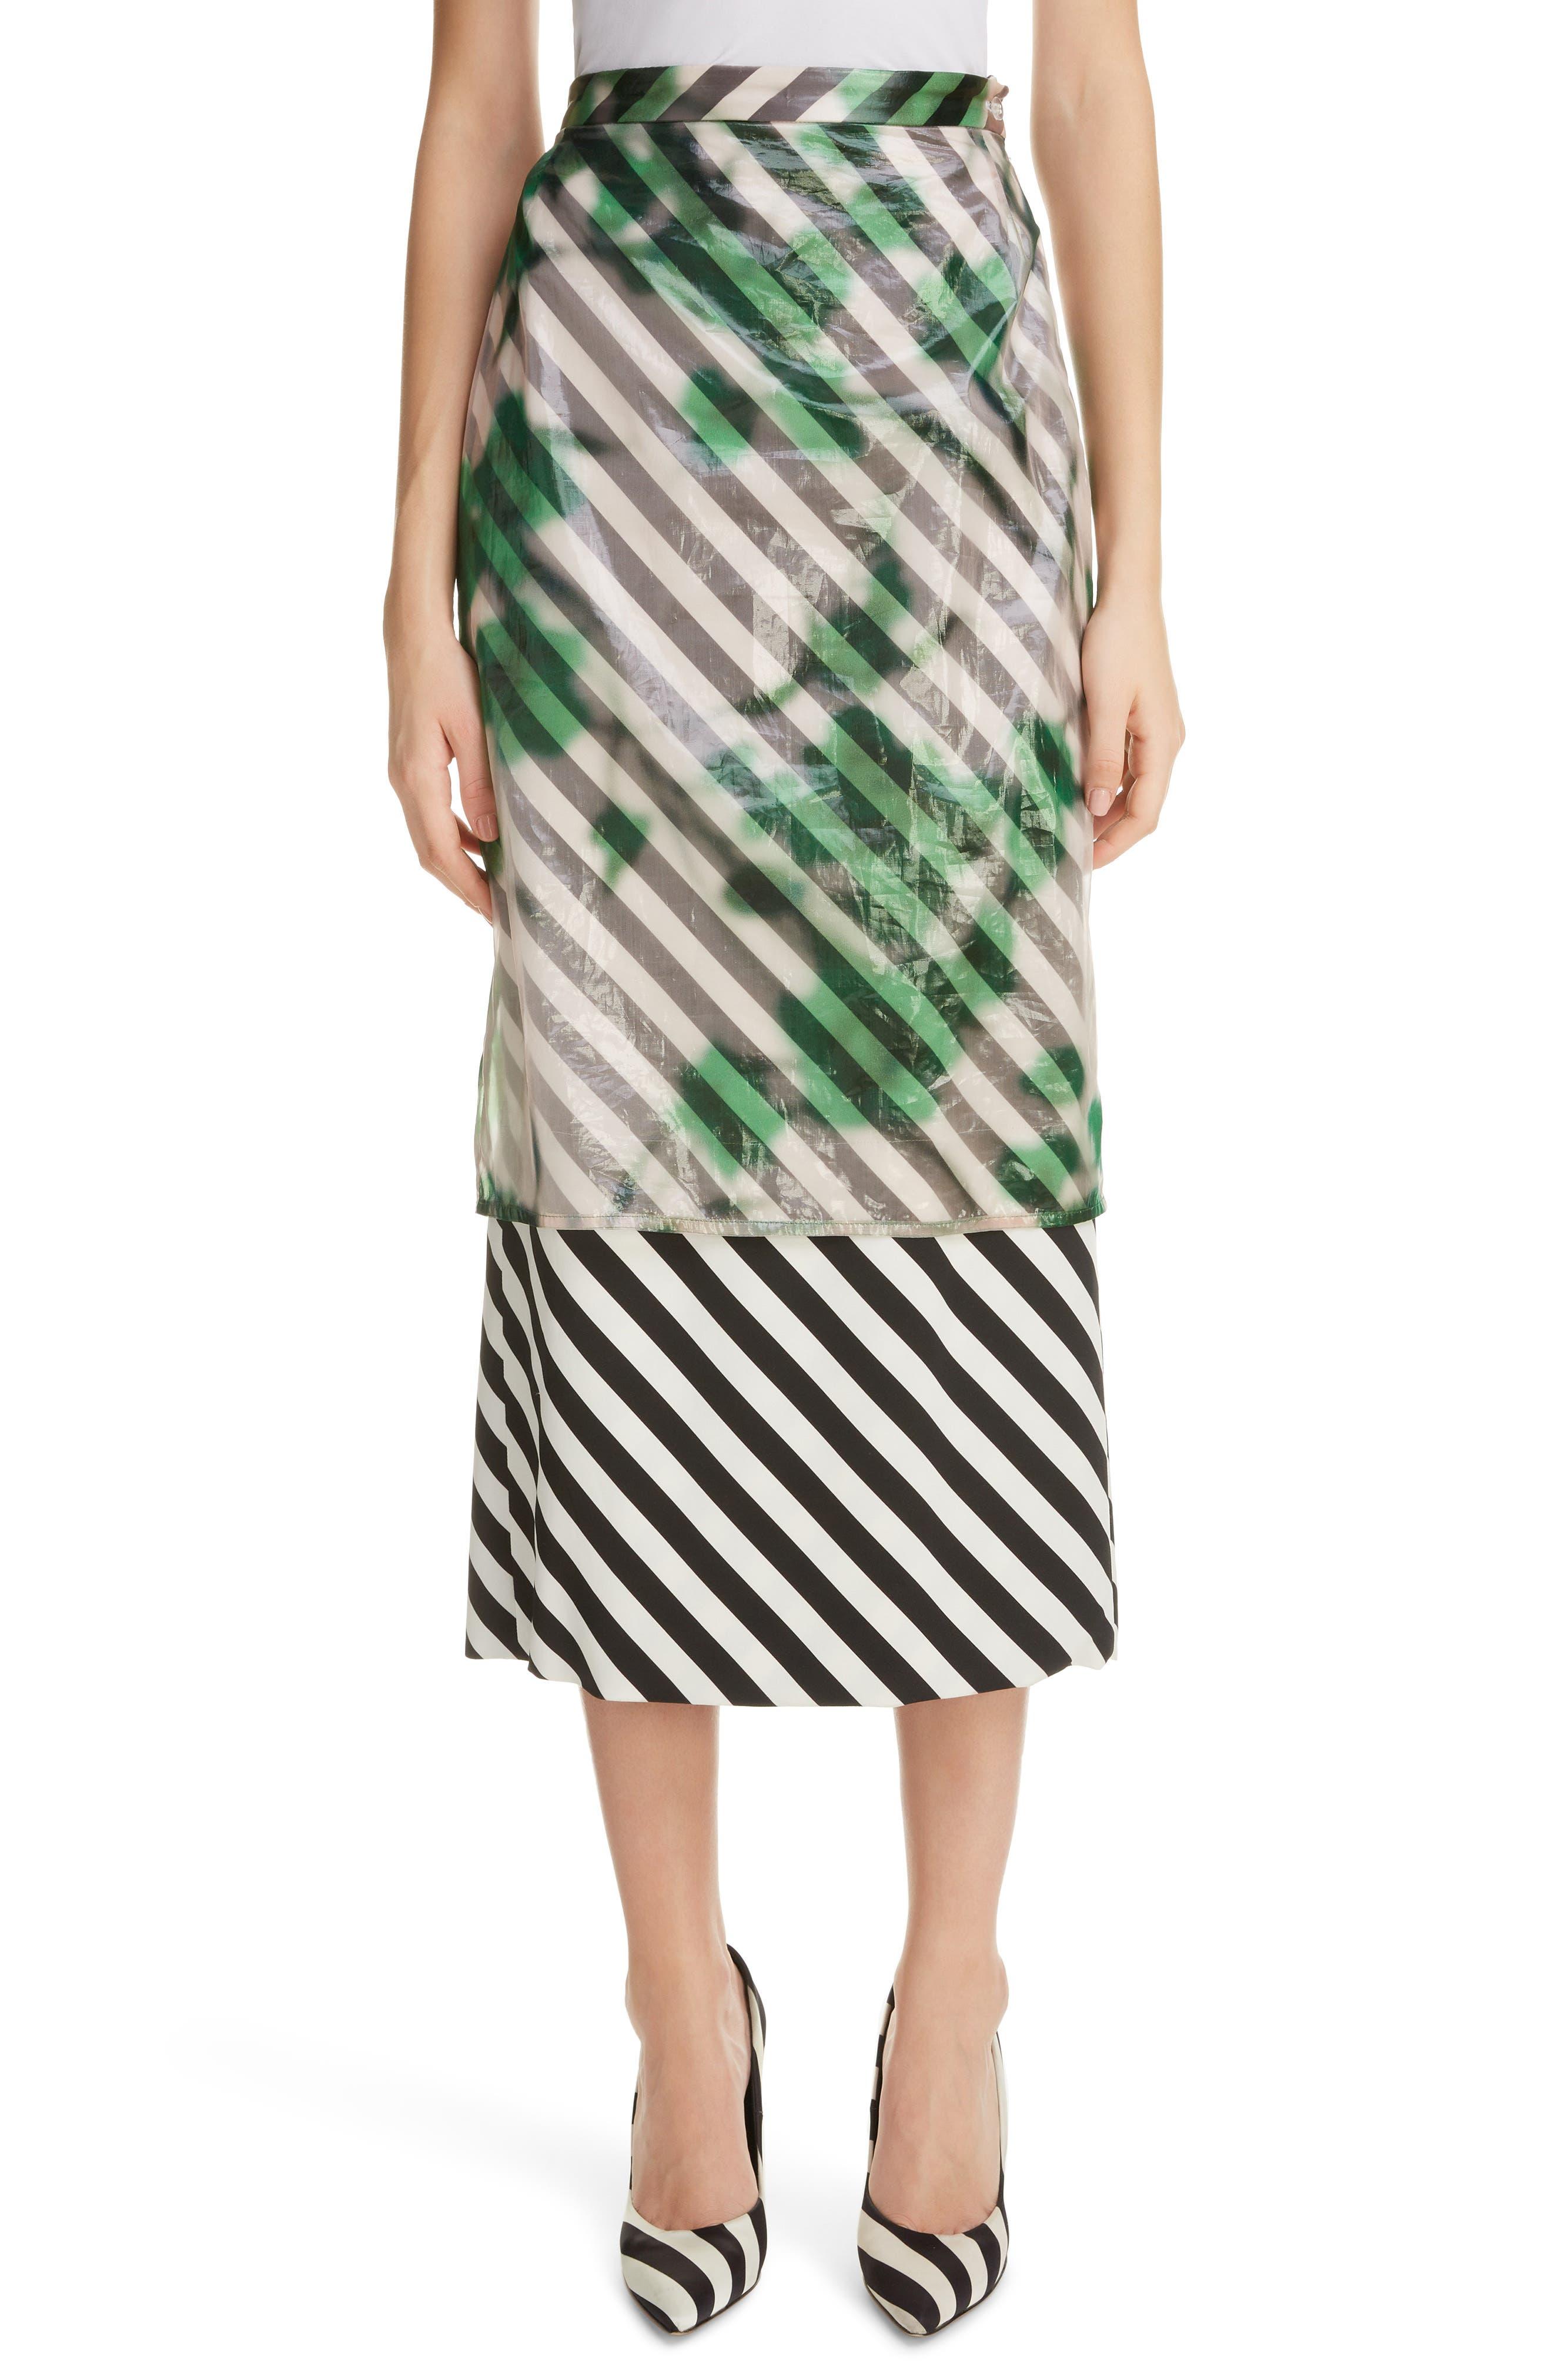 DRIES VAN NOTEN, Dires Van Noten Painted Overlay Silk Blend Pencil Skirt, Main thumbnail 1, color, 604-GREEN